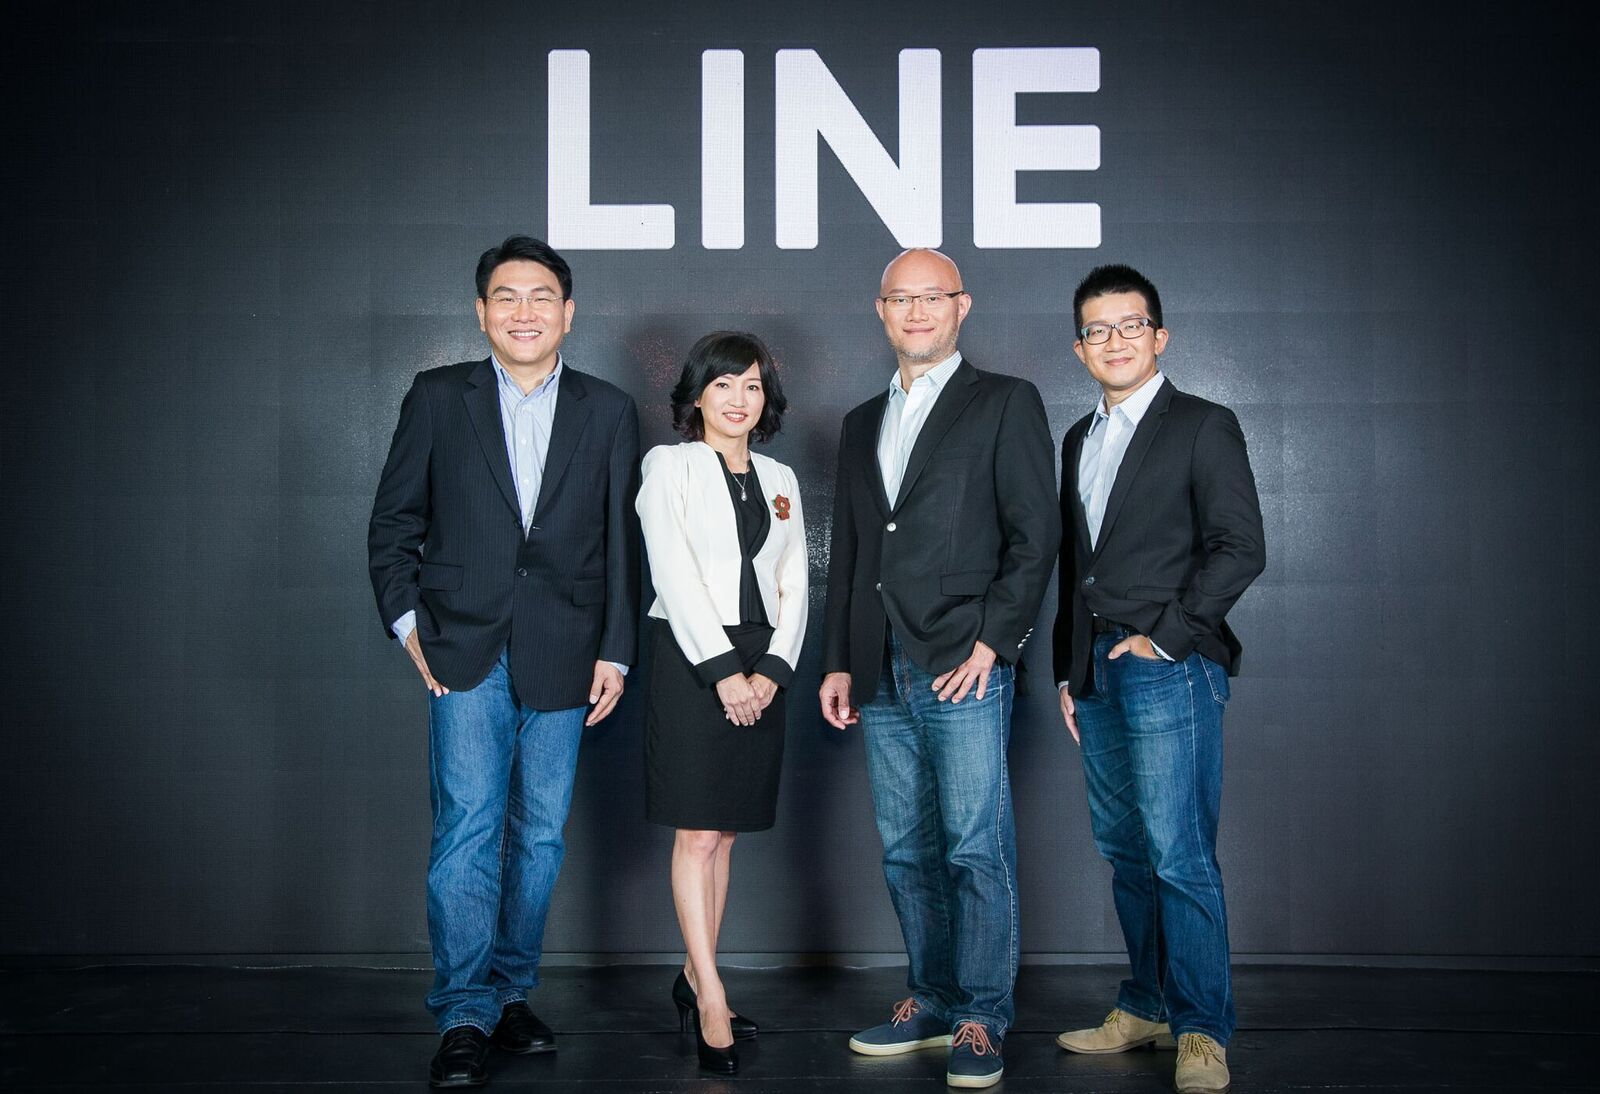 LINE 也正式宣布加入雙 11 購物節促銷活動